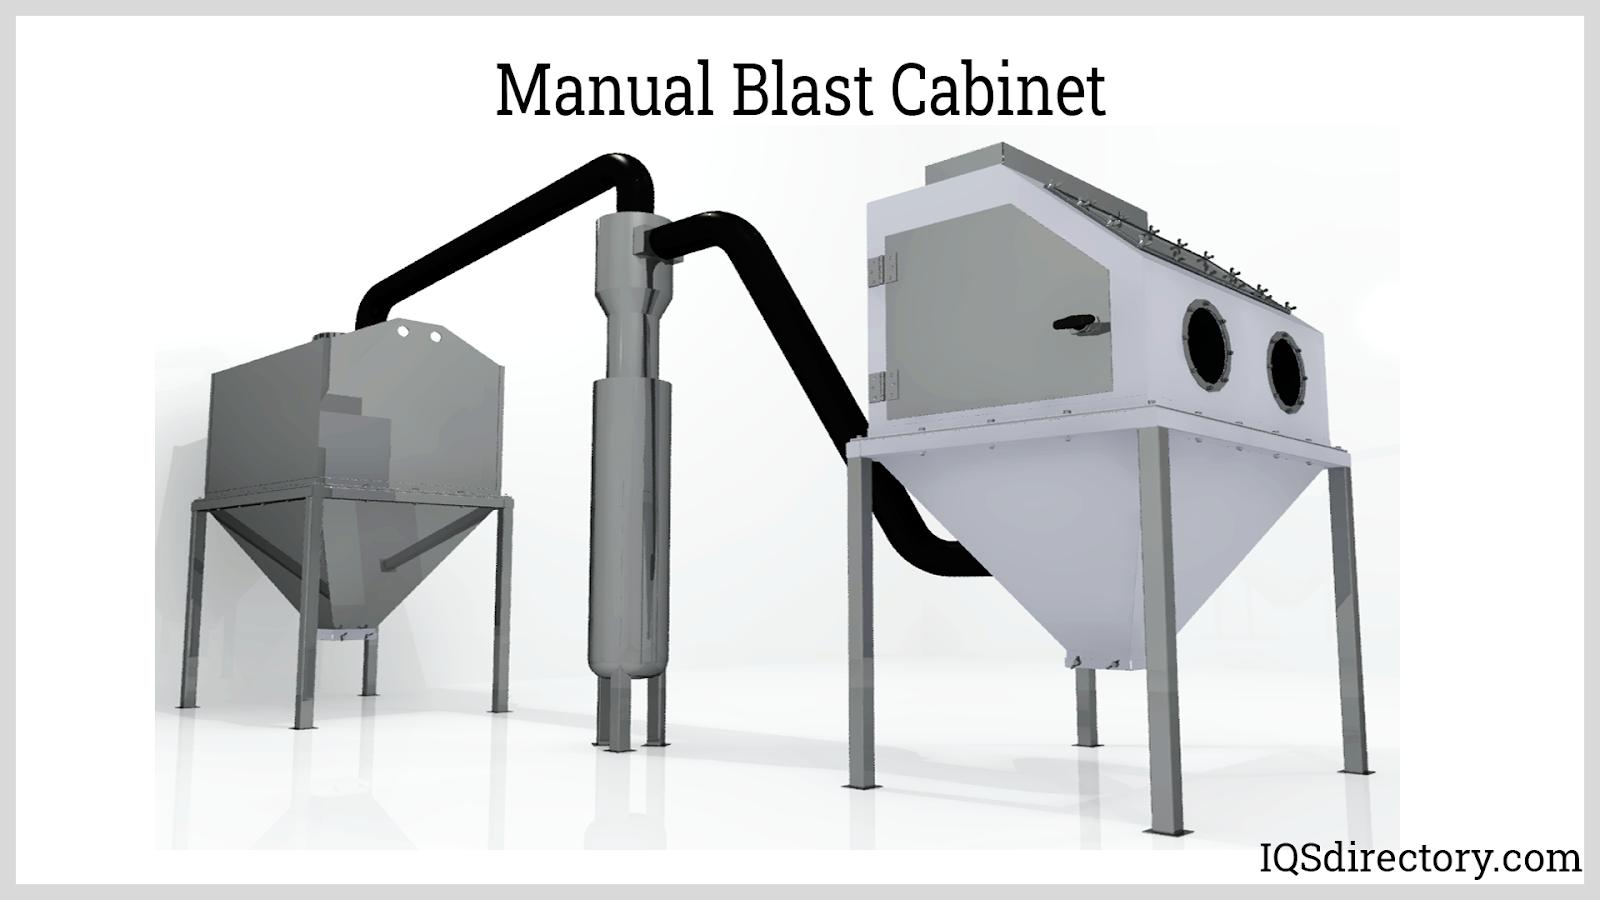 Manual Blast Cabinet